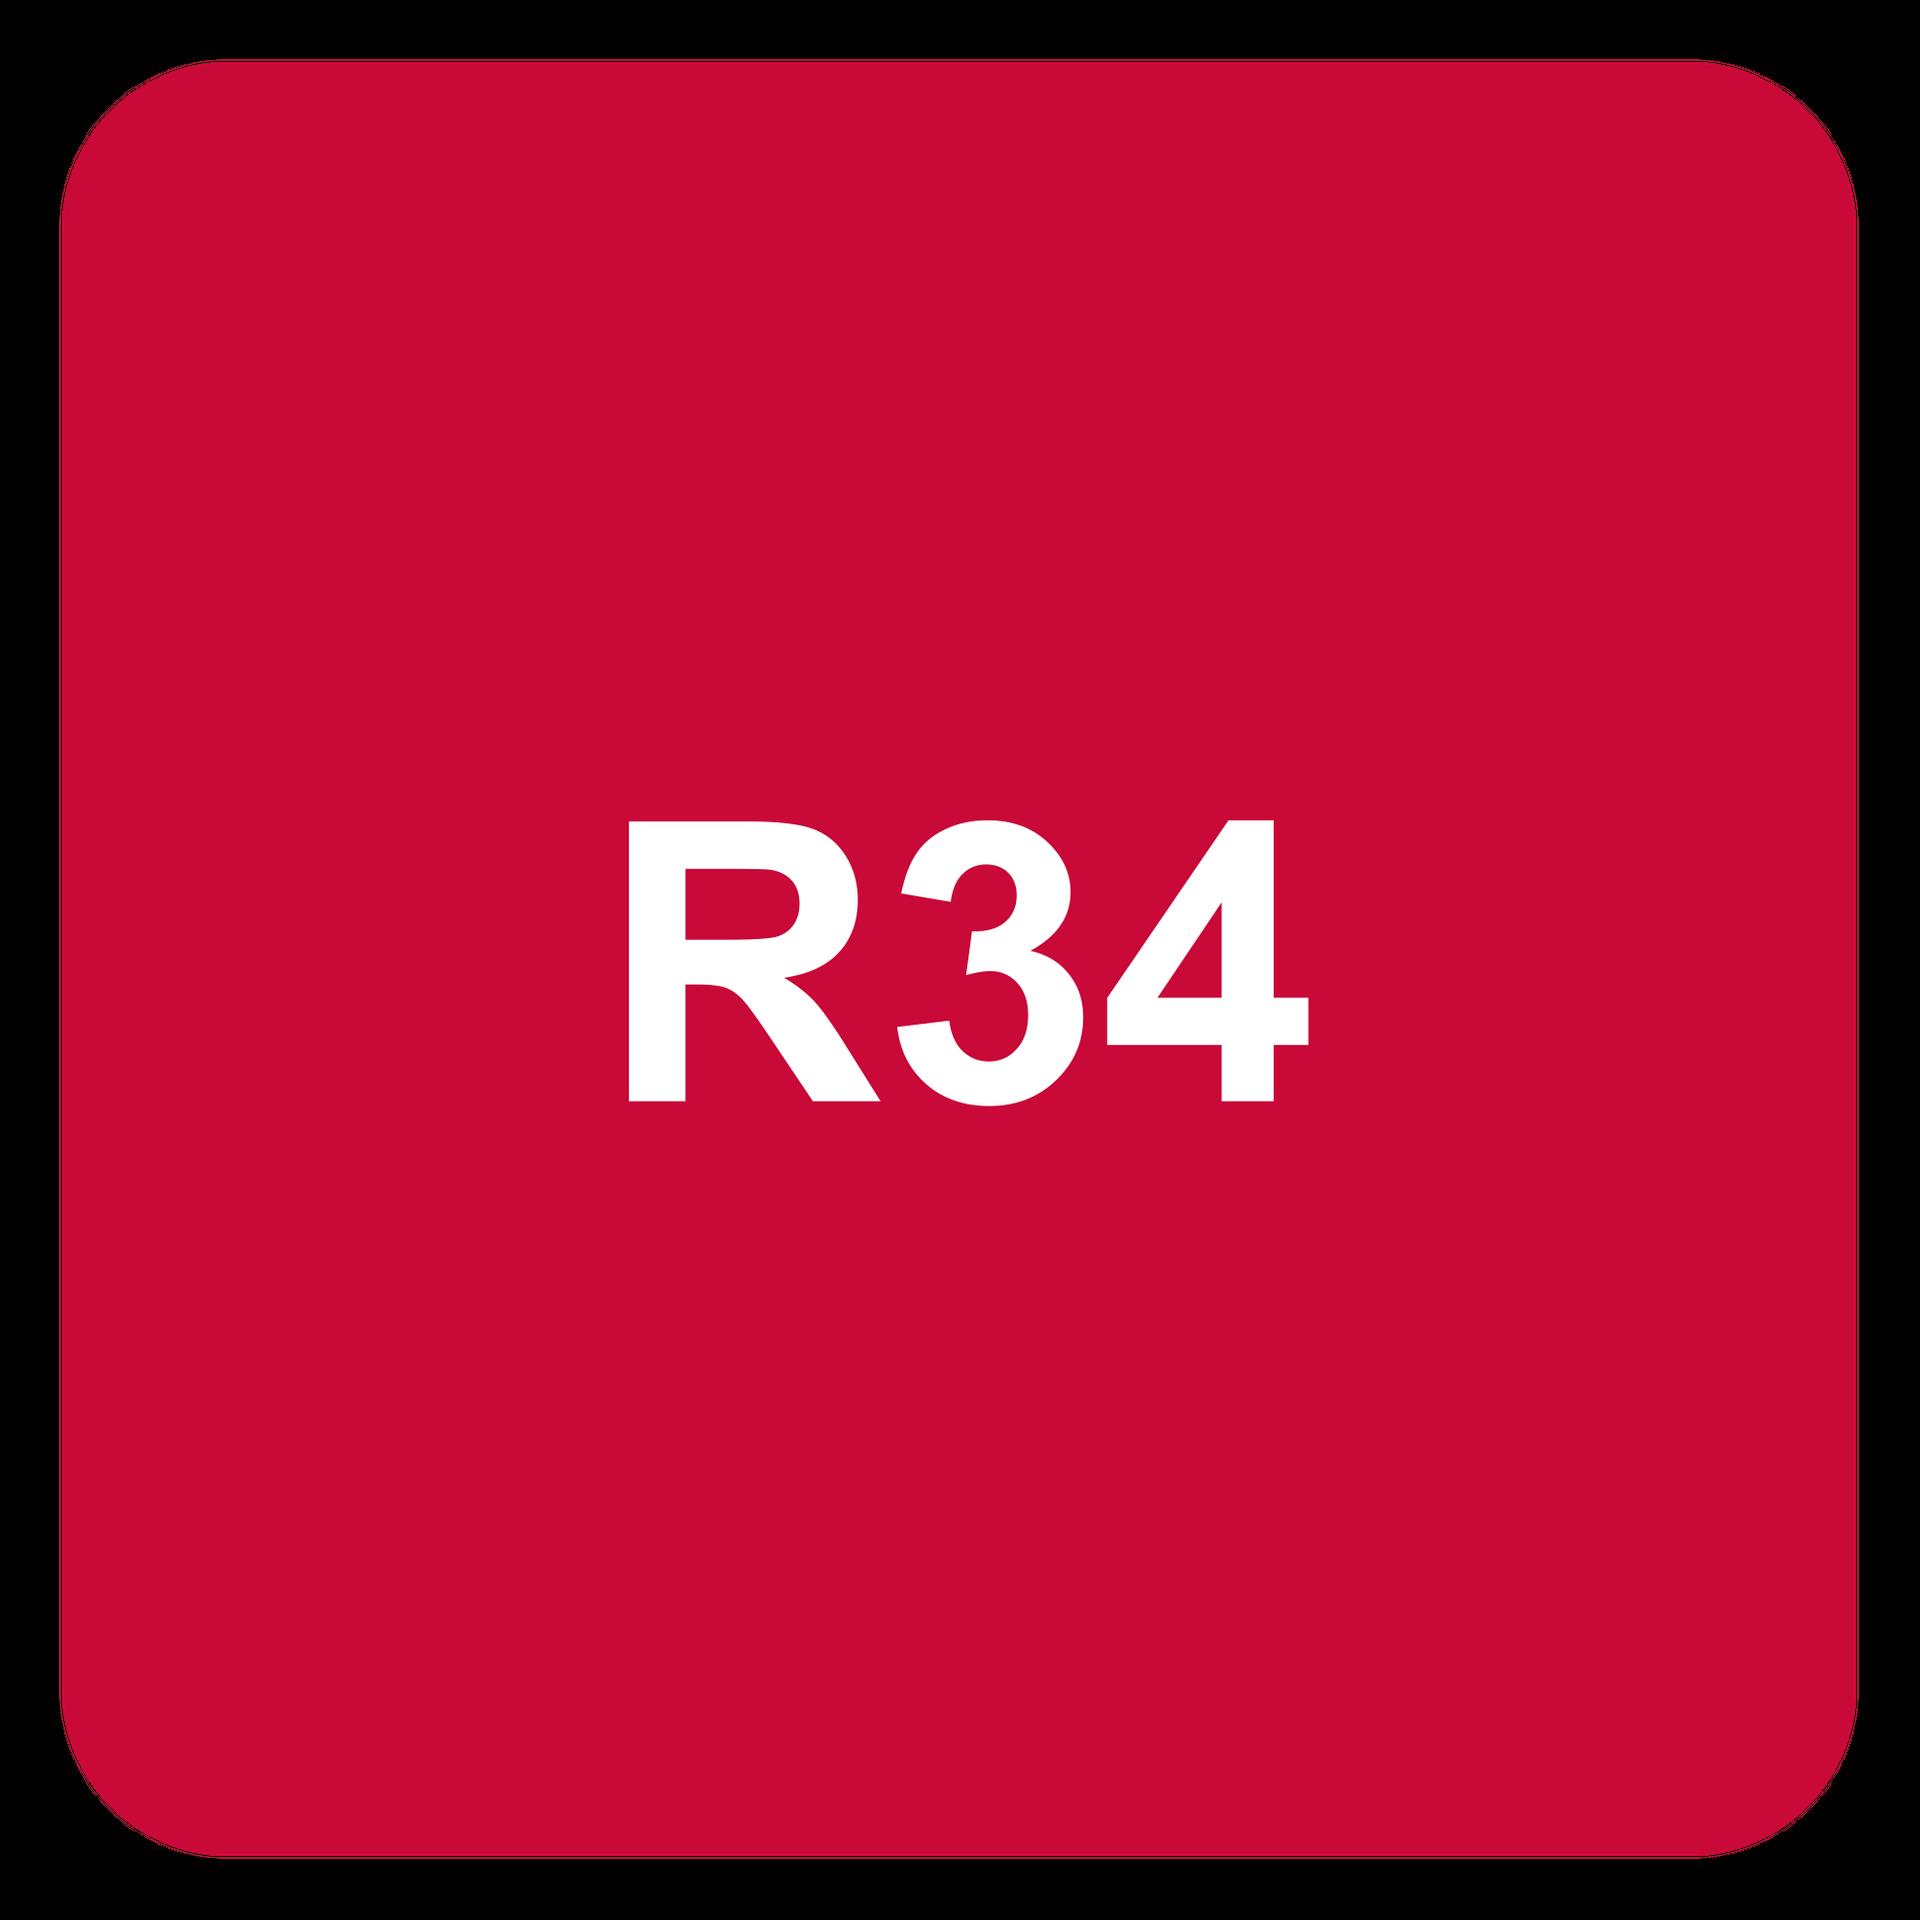 R34 SKYLINE